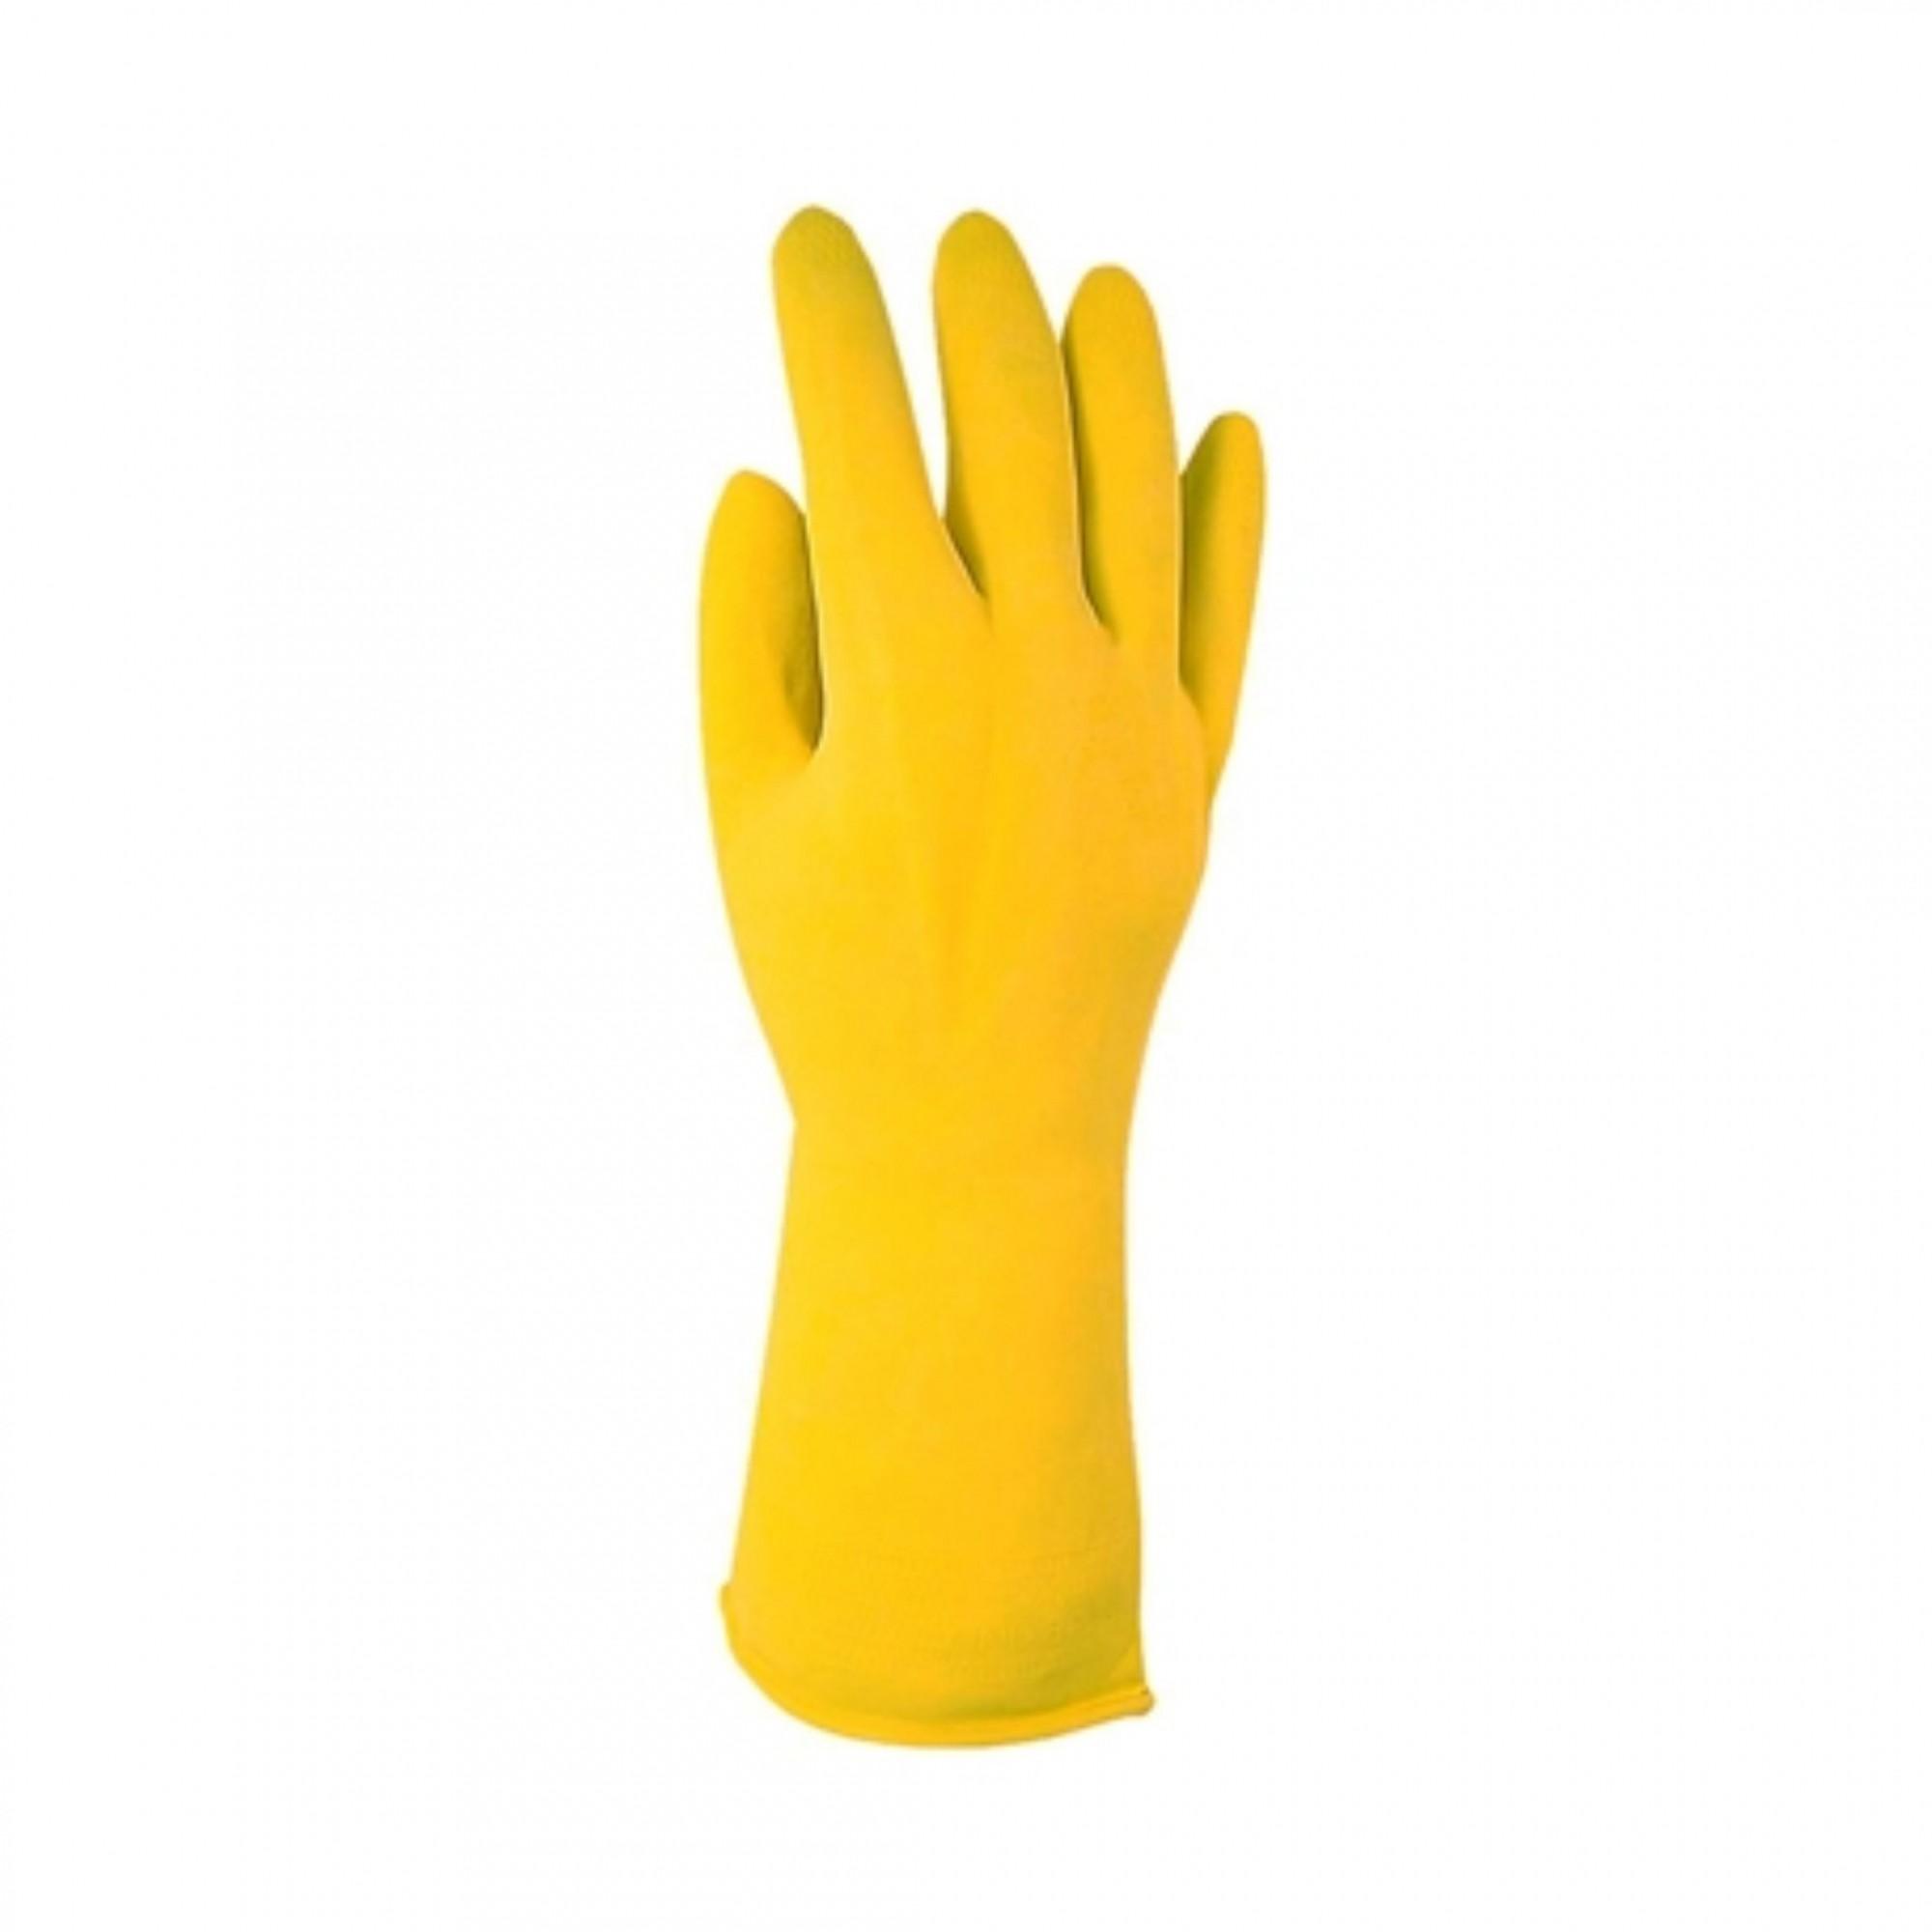 Luva Top Multiuso Para Limpeza Amarela P Sanro